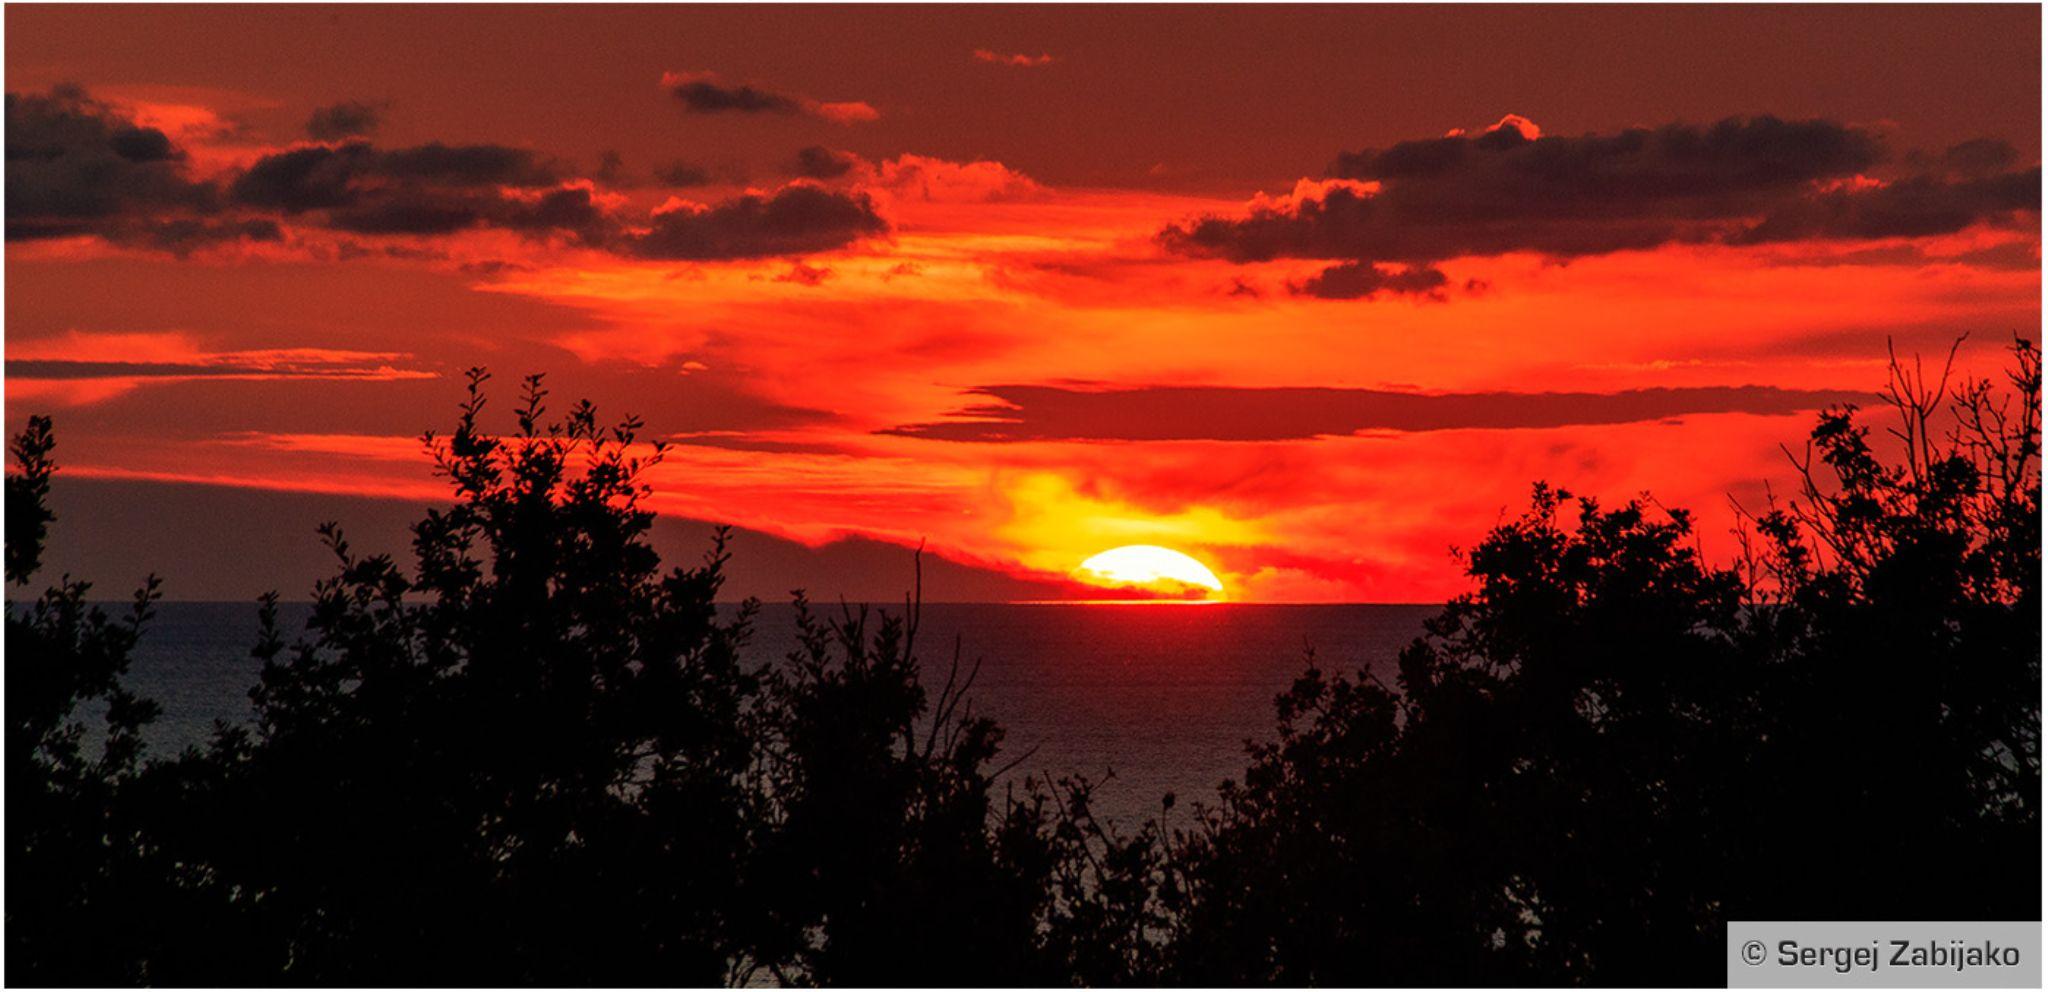 A sunset. Bar. Montenegro. by Sergej Zabijako